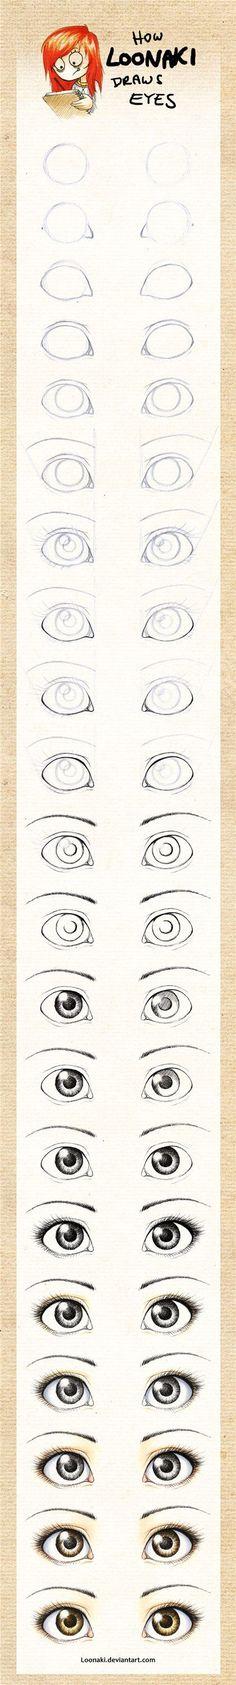 Modelo de olho